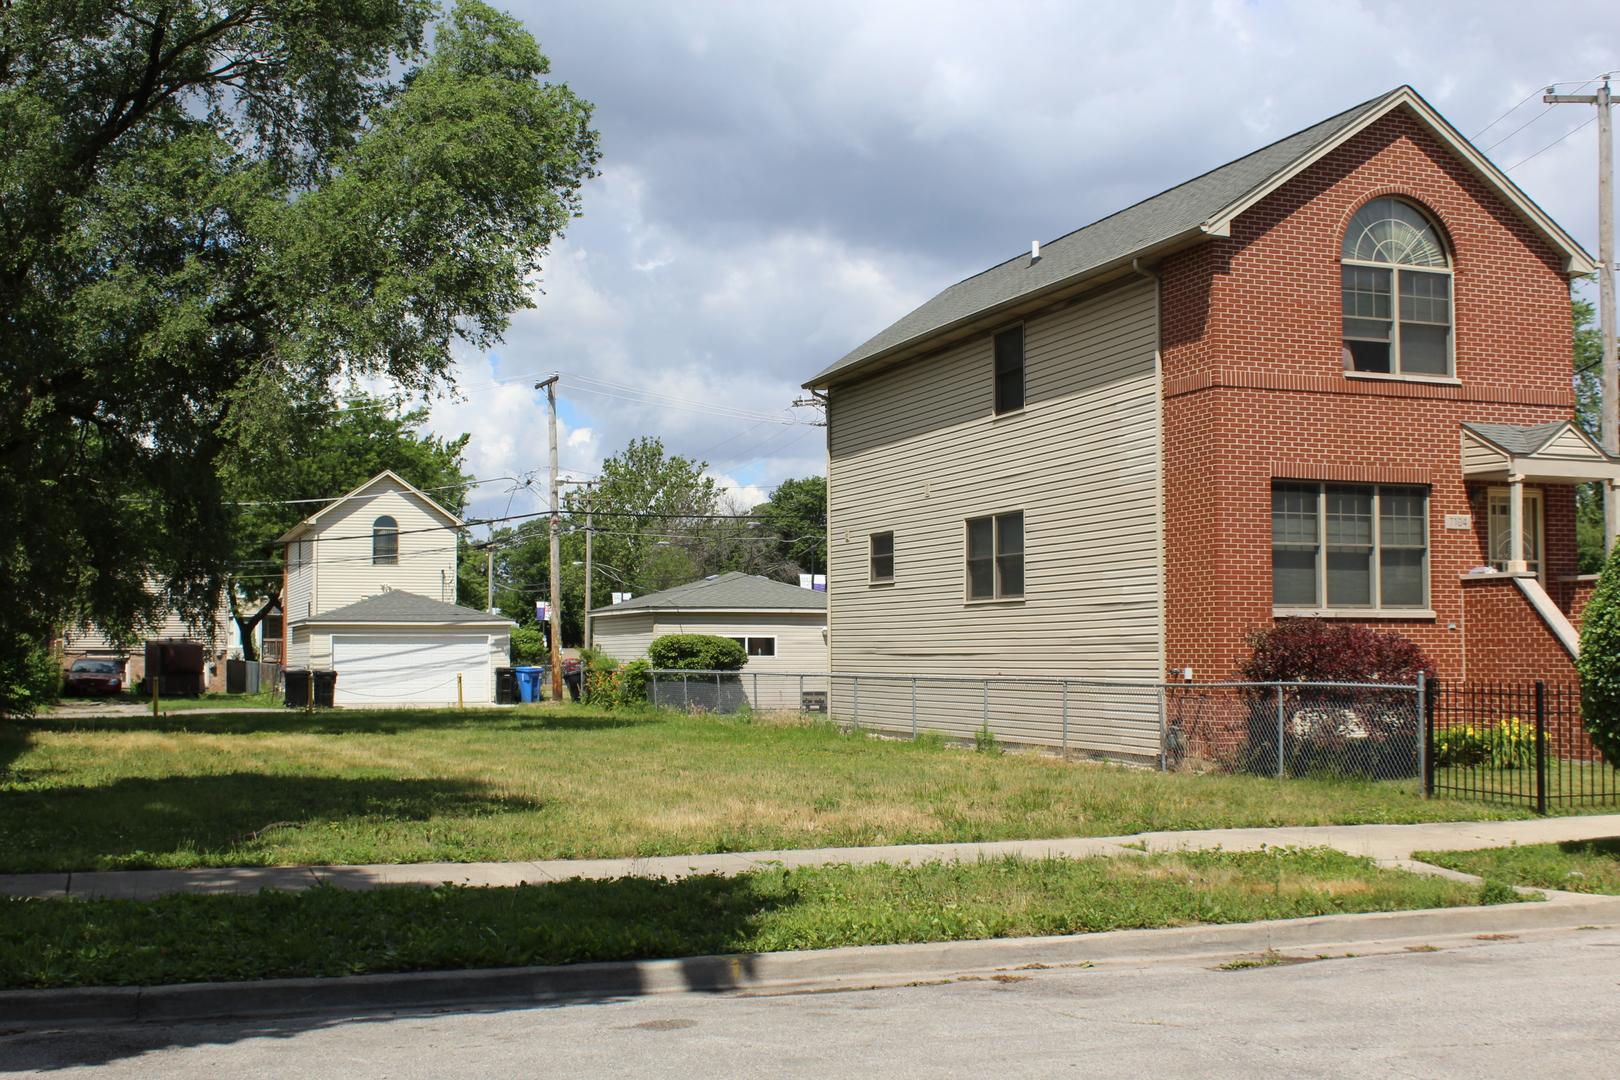 7108 Greenwood, Chicago, Illinois 60619